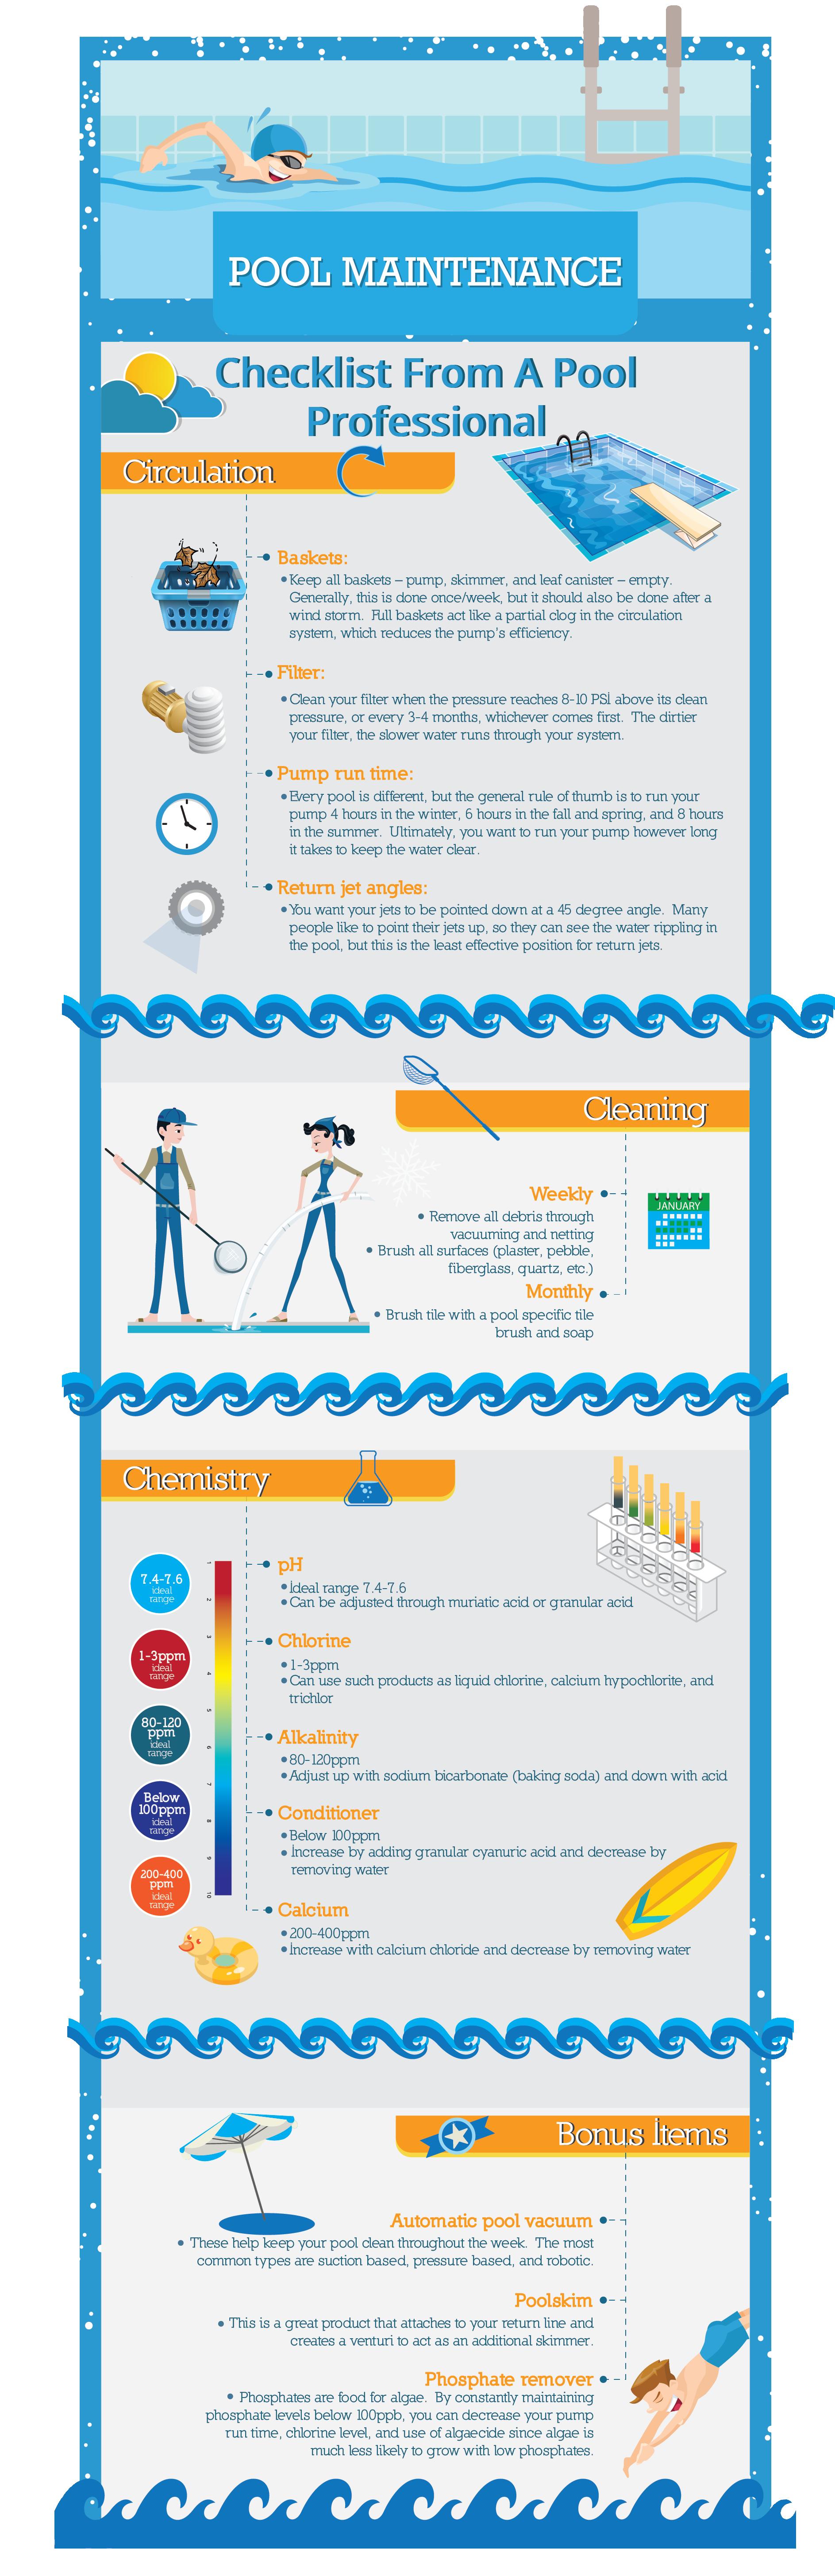 Irvine Pool Maintenance Checklist